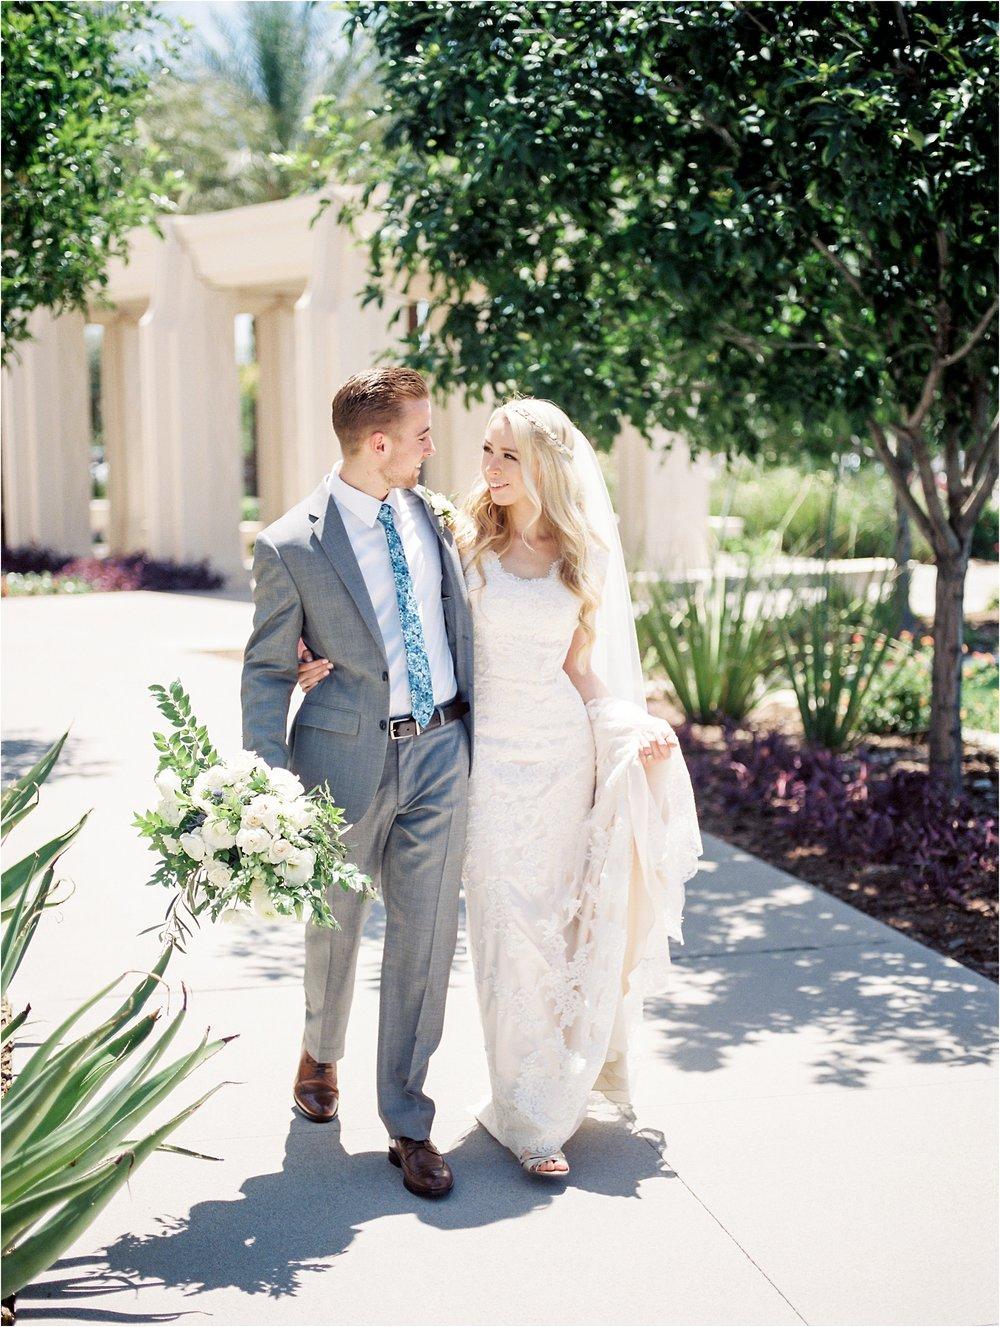 Sarah Jane Photography Film Hybrid Scottsdale Phoenix Arizona Destination Wedding Photographer Julie ans Mason_0016.jpg